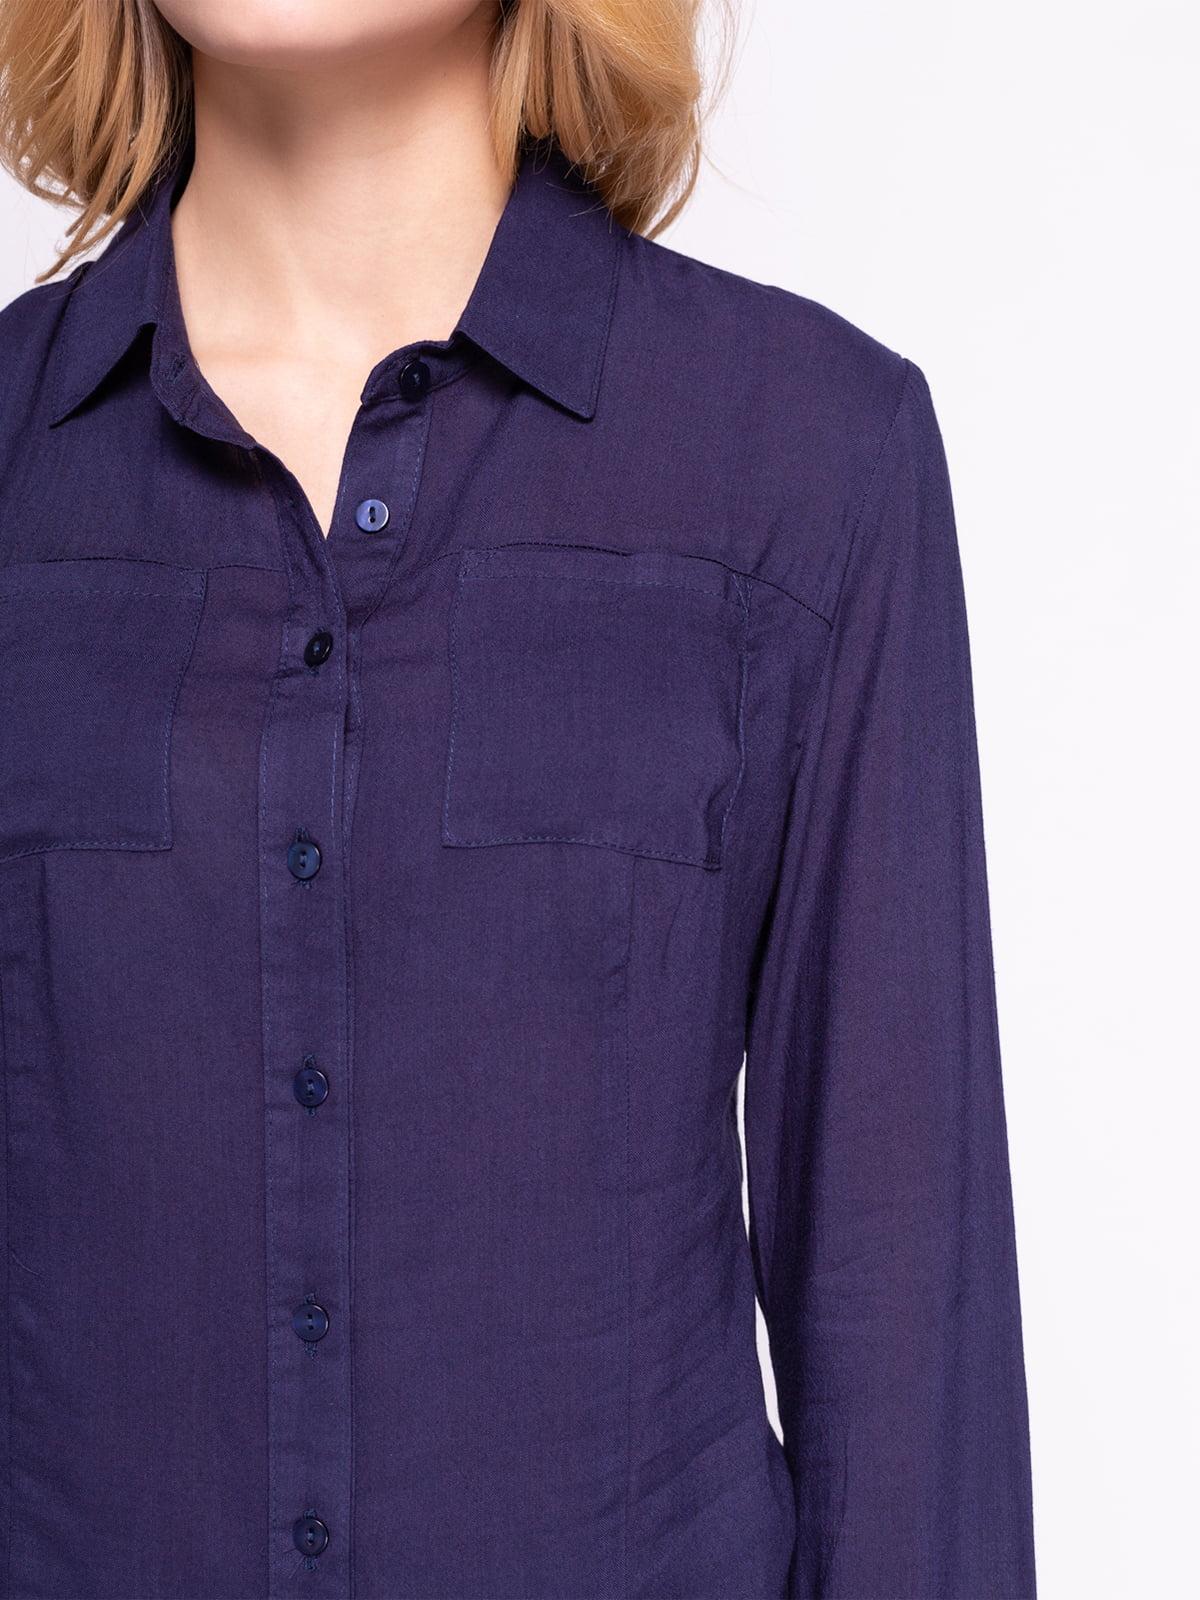 Рубашка темно-синяя | 4855854 | фото 3